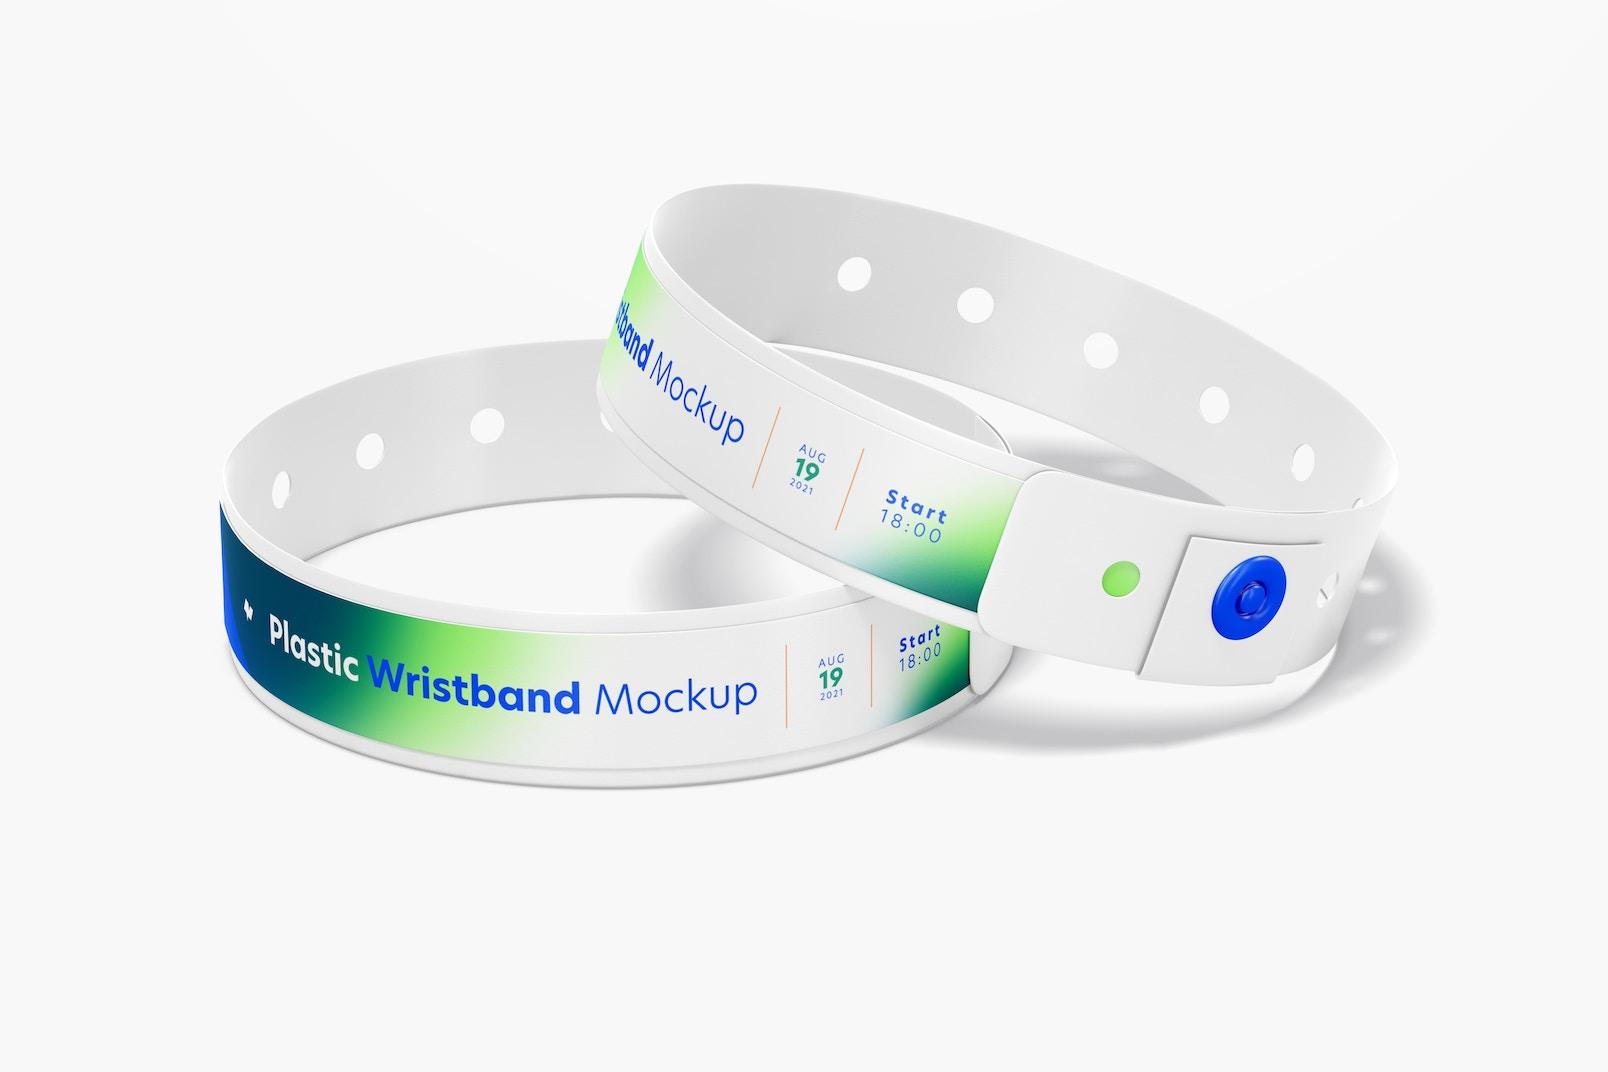 Plastic Wristband Mockup, Closed